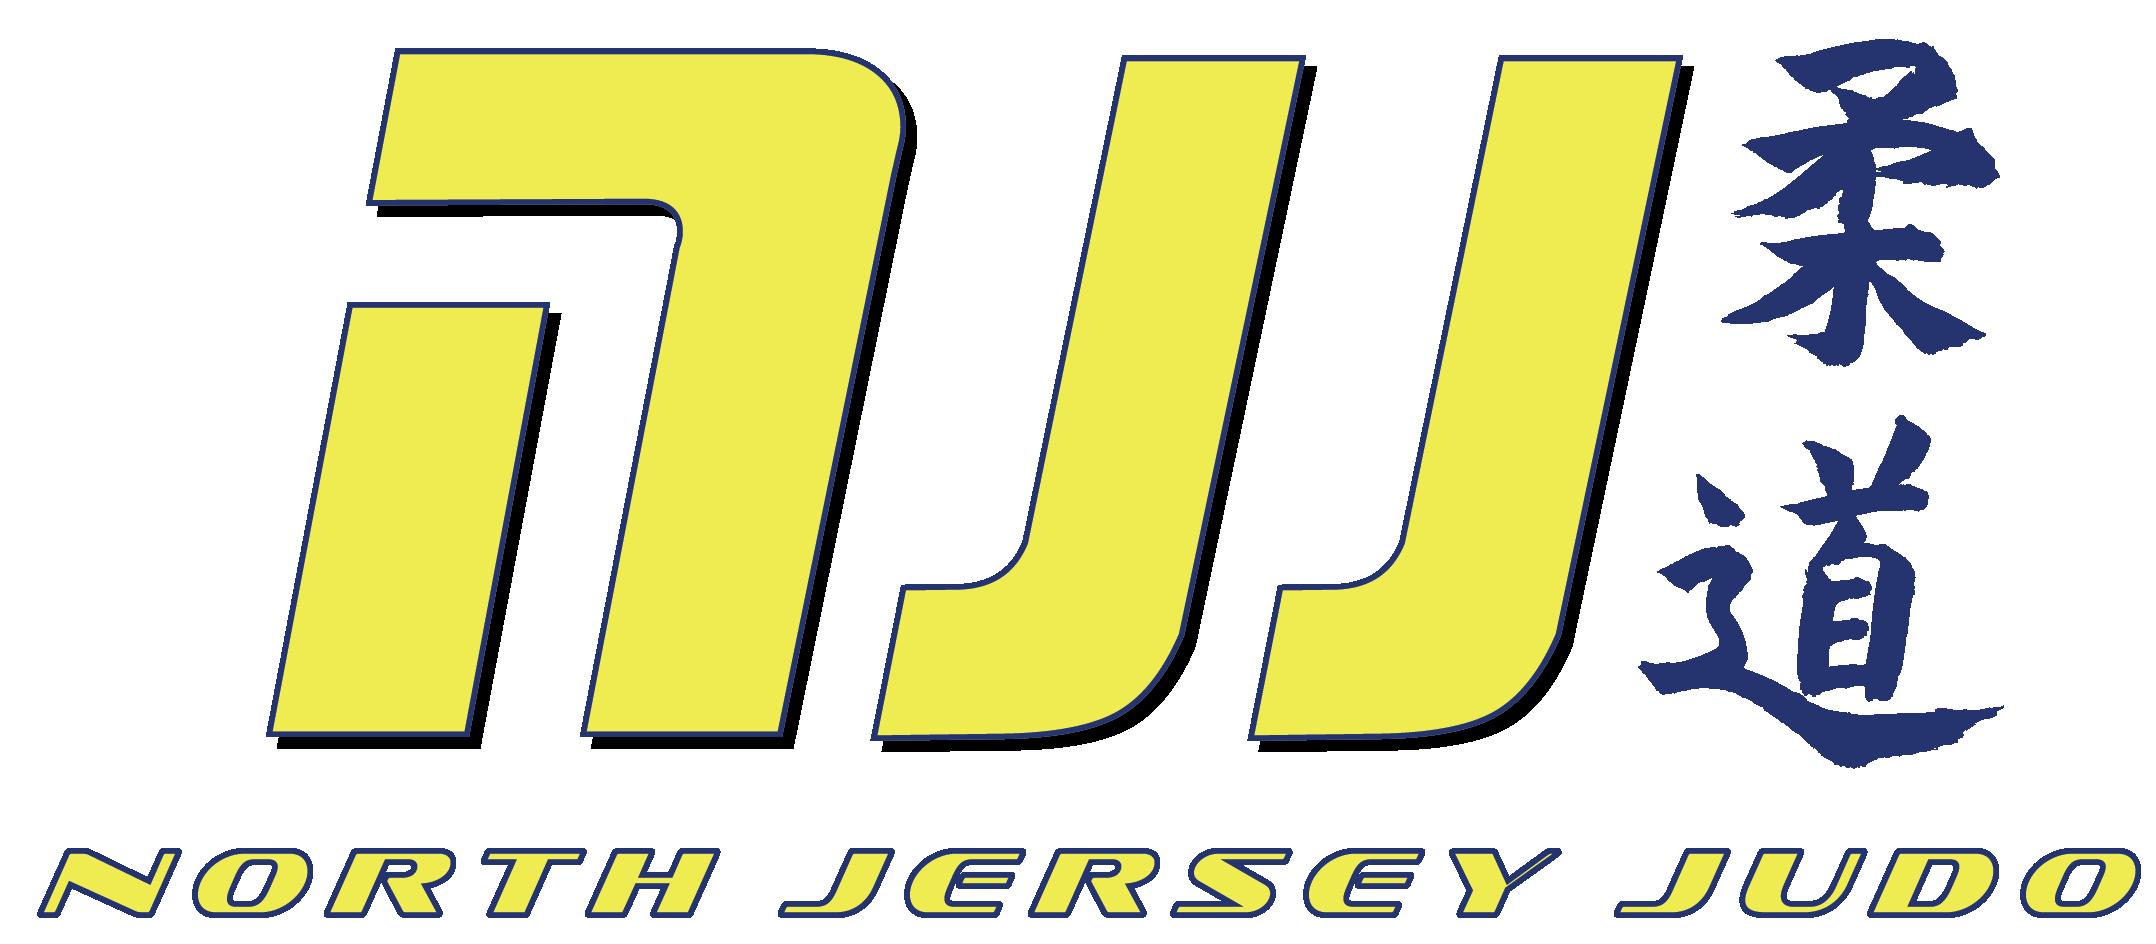 North Jersey Judo